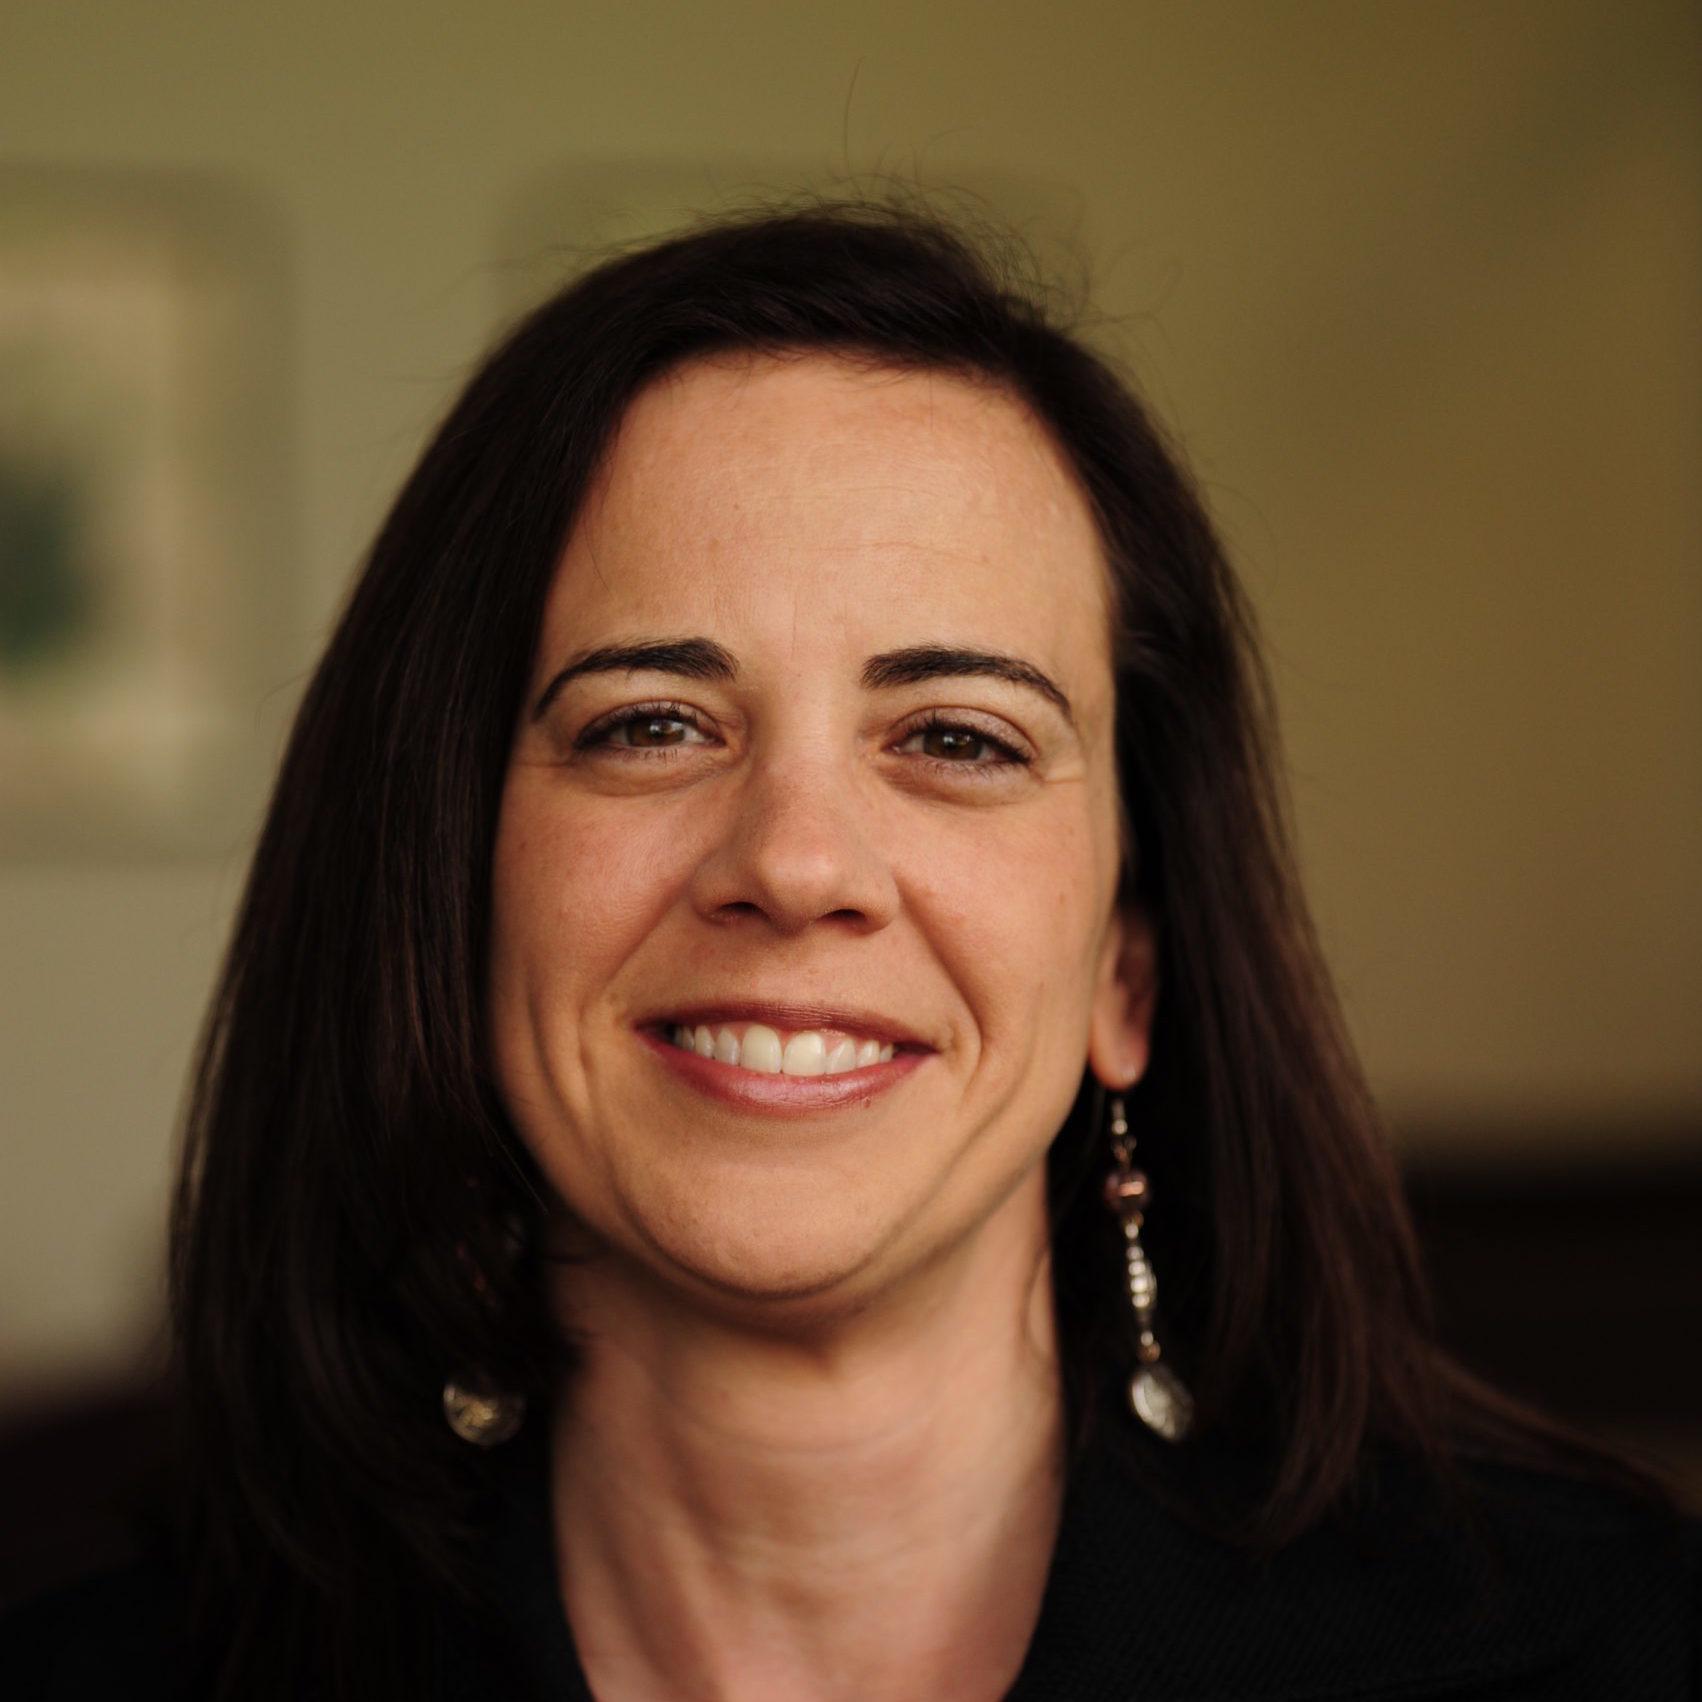 Heather M. Stephens